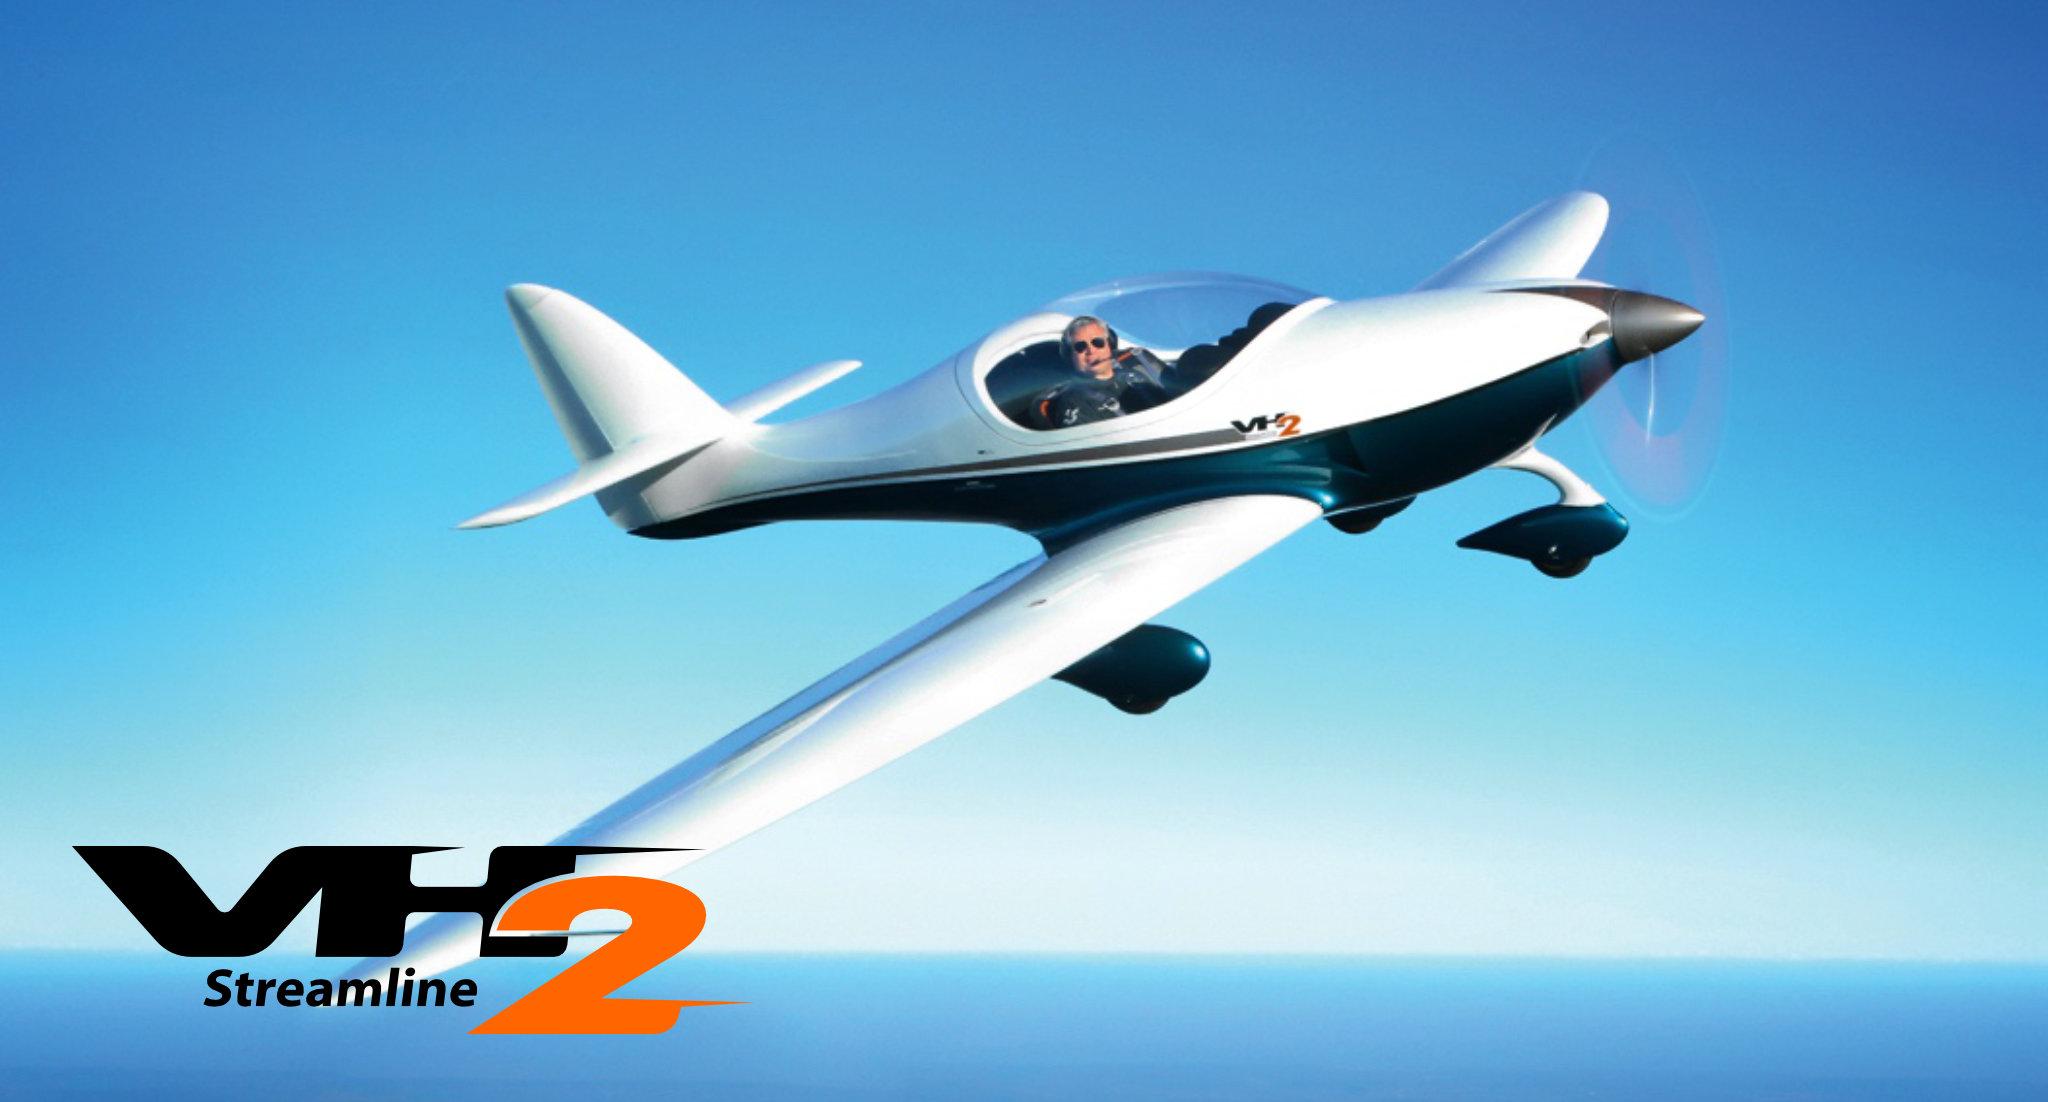 Amateur aircraft design opinion you